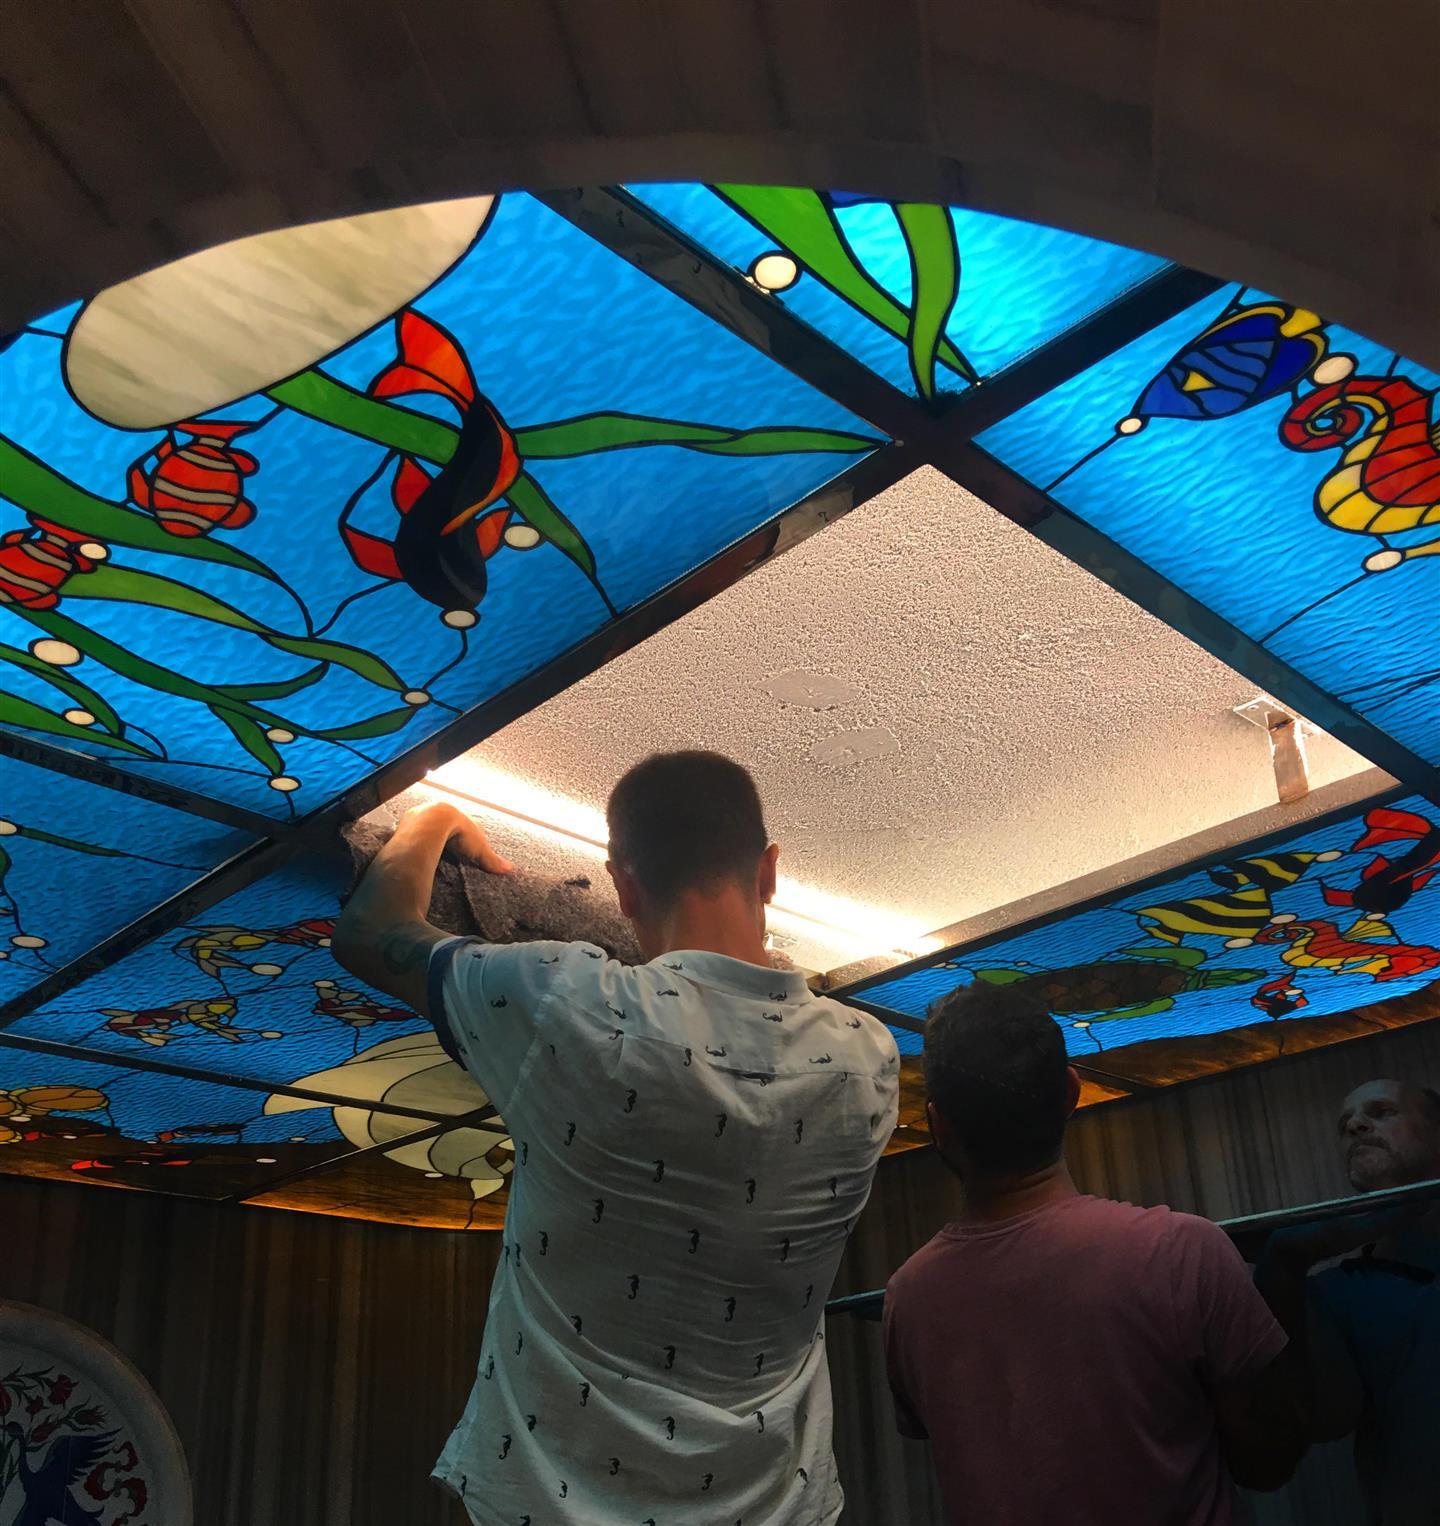 hamam-banyo-tavan-vitraylari20171221185137667.jpg izmir vitray çalışması